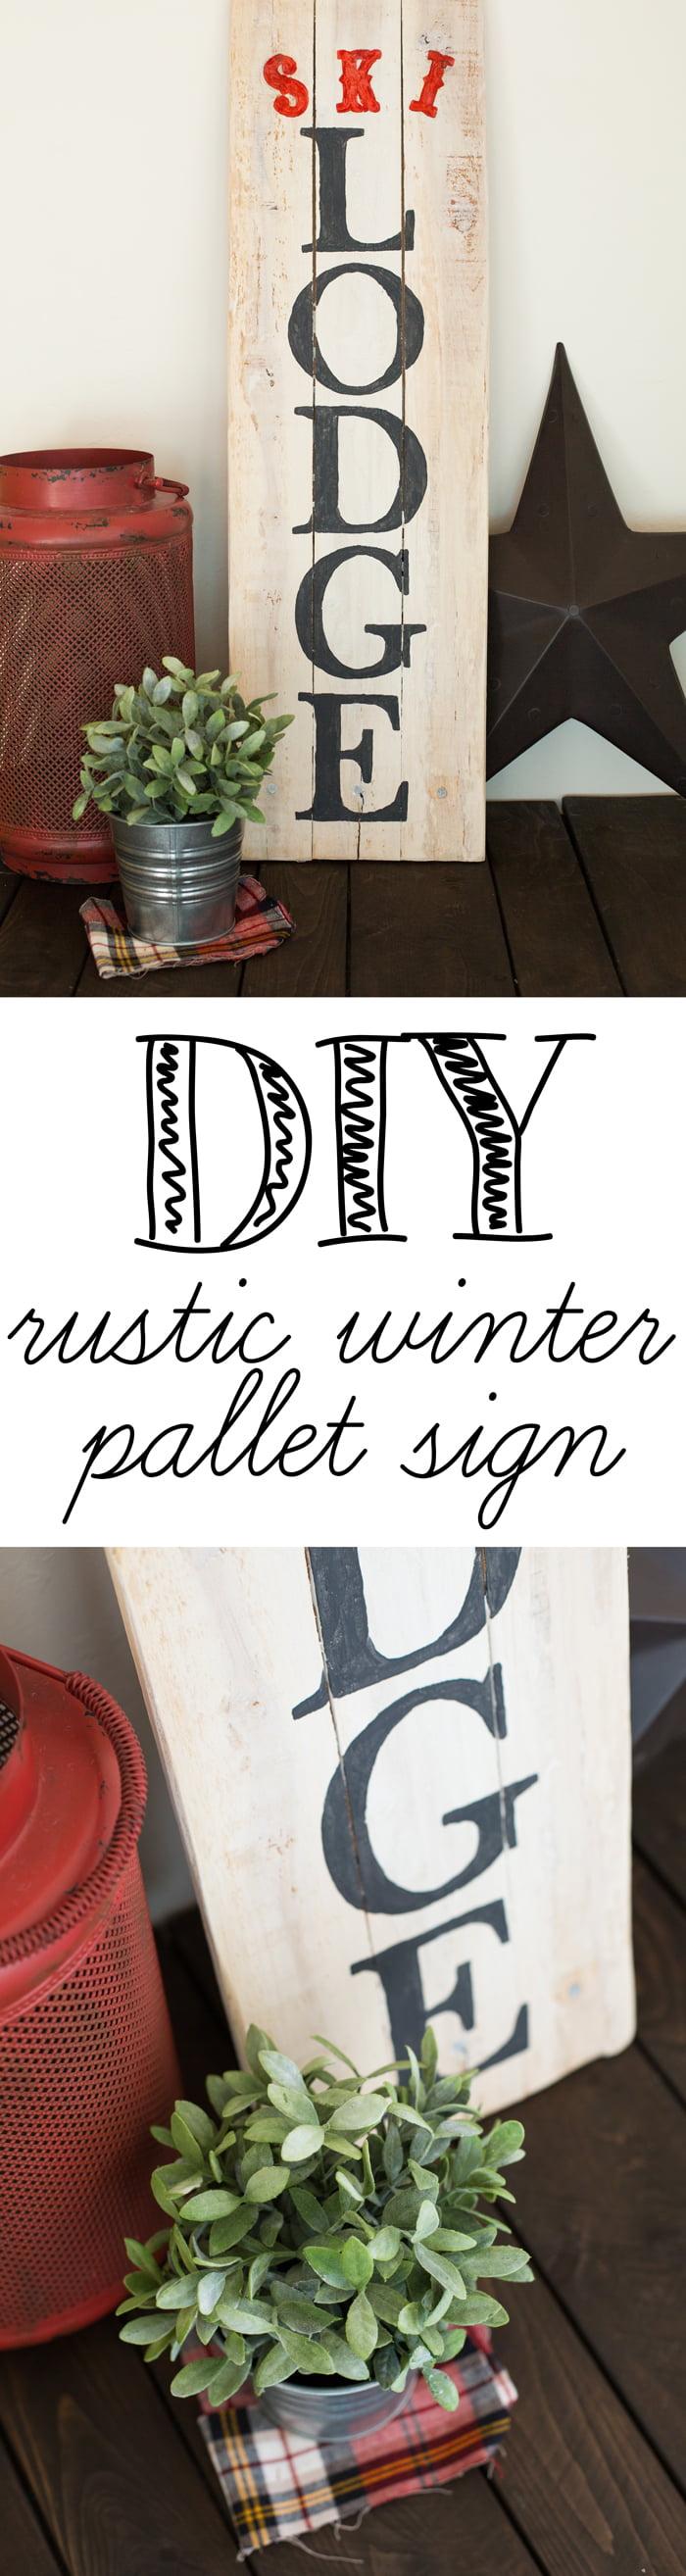 DIY Rustic winter pallet sign